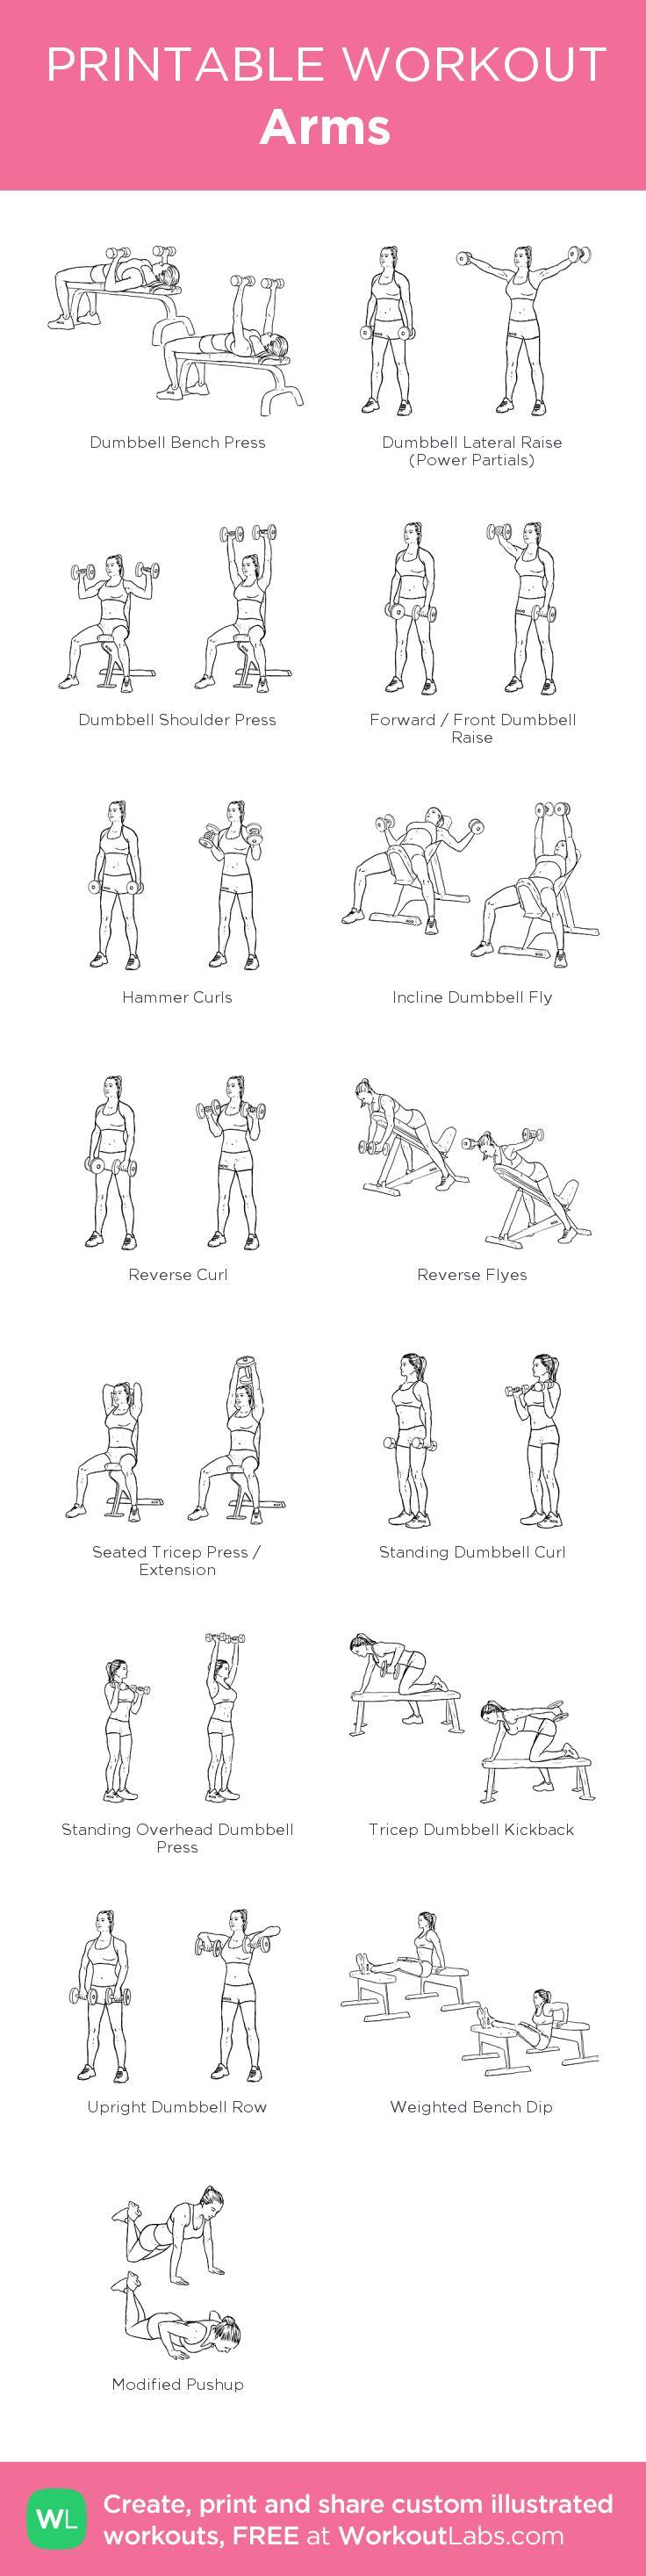 Arms: my custom printable workout by @WorkoutLabs #workoutlabs #customworkout